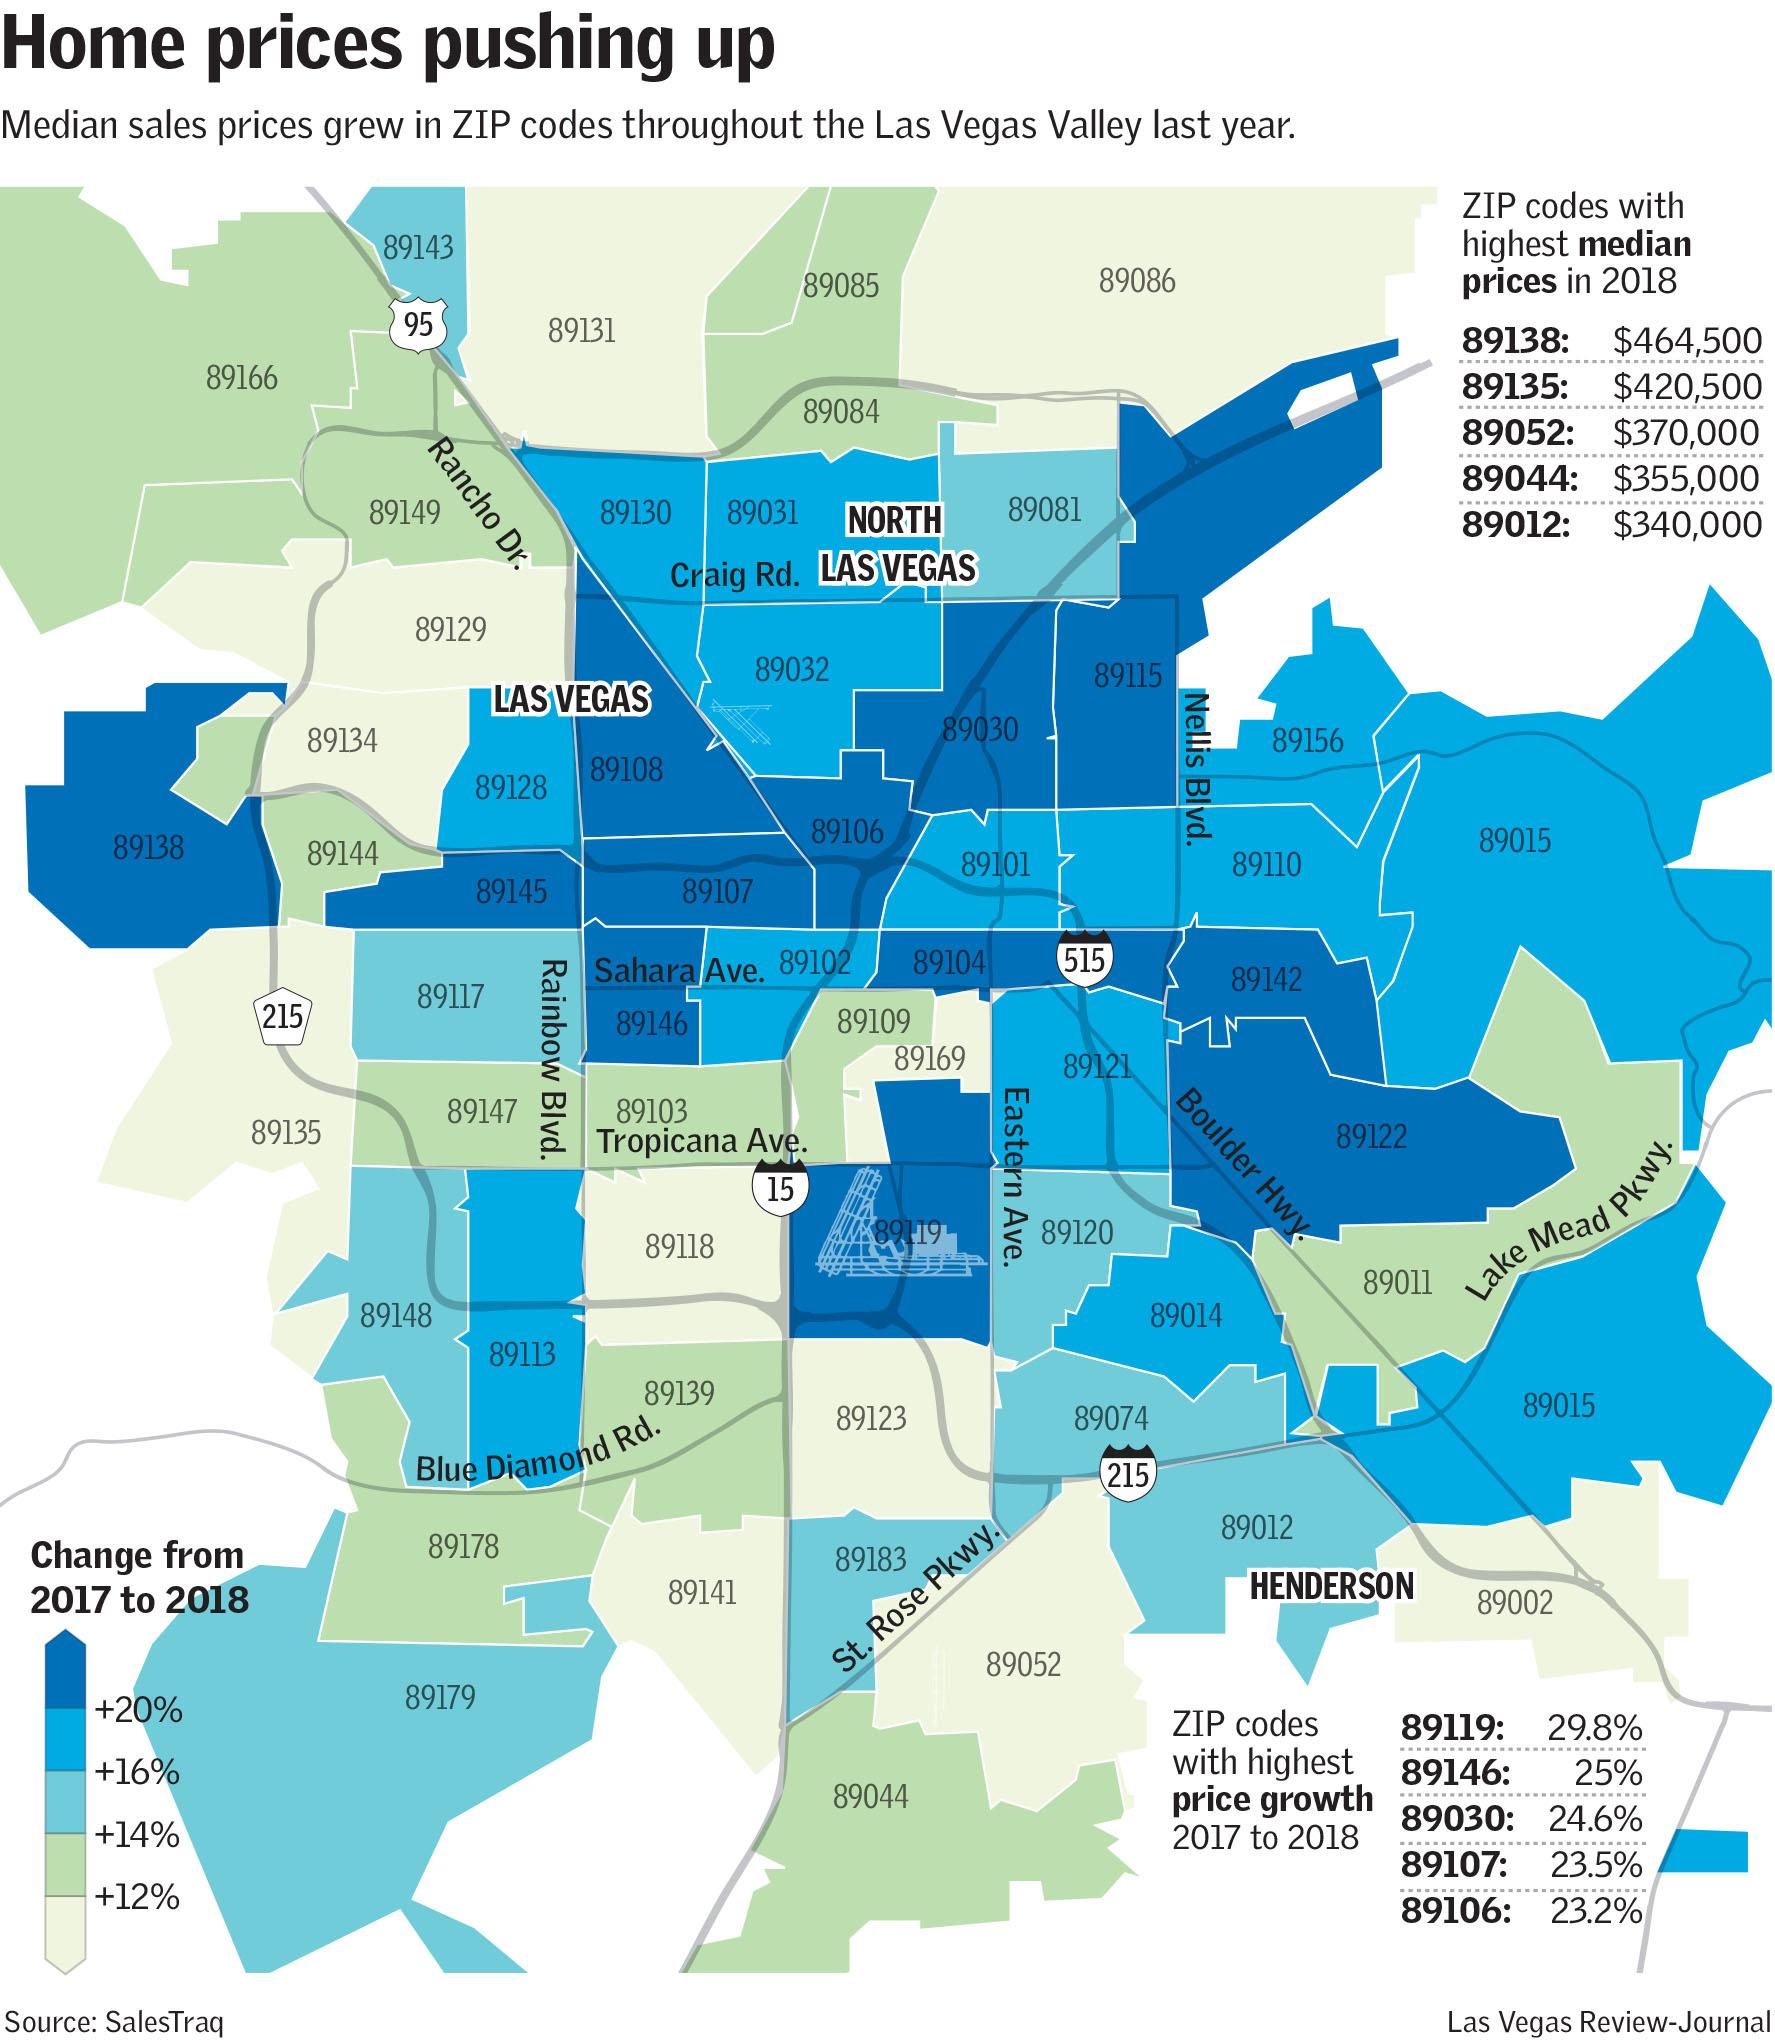 Las Vegas Valley Home Prices